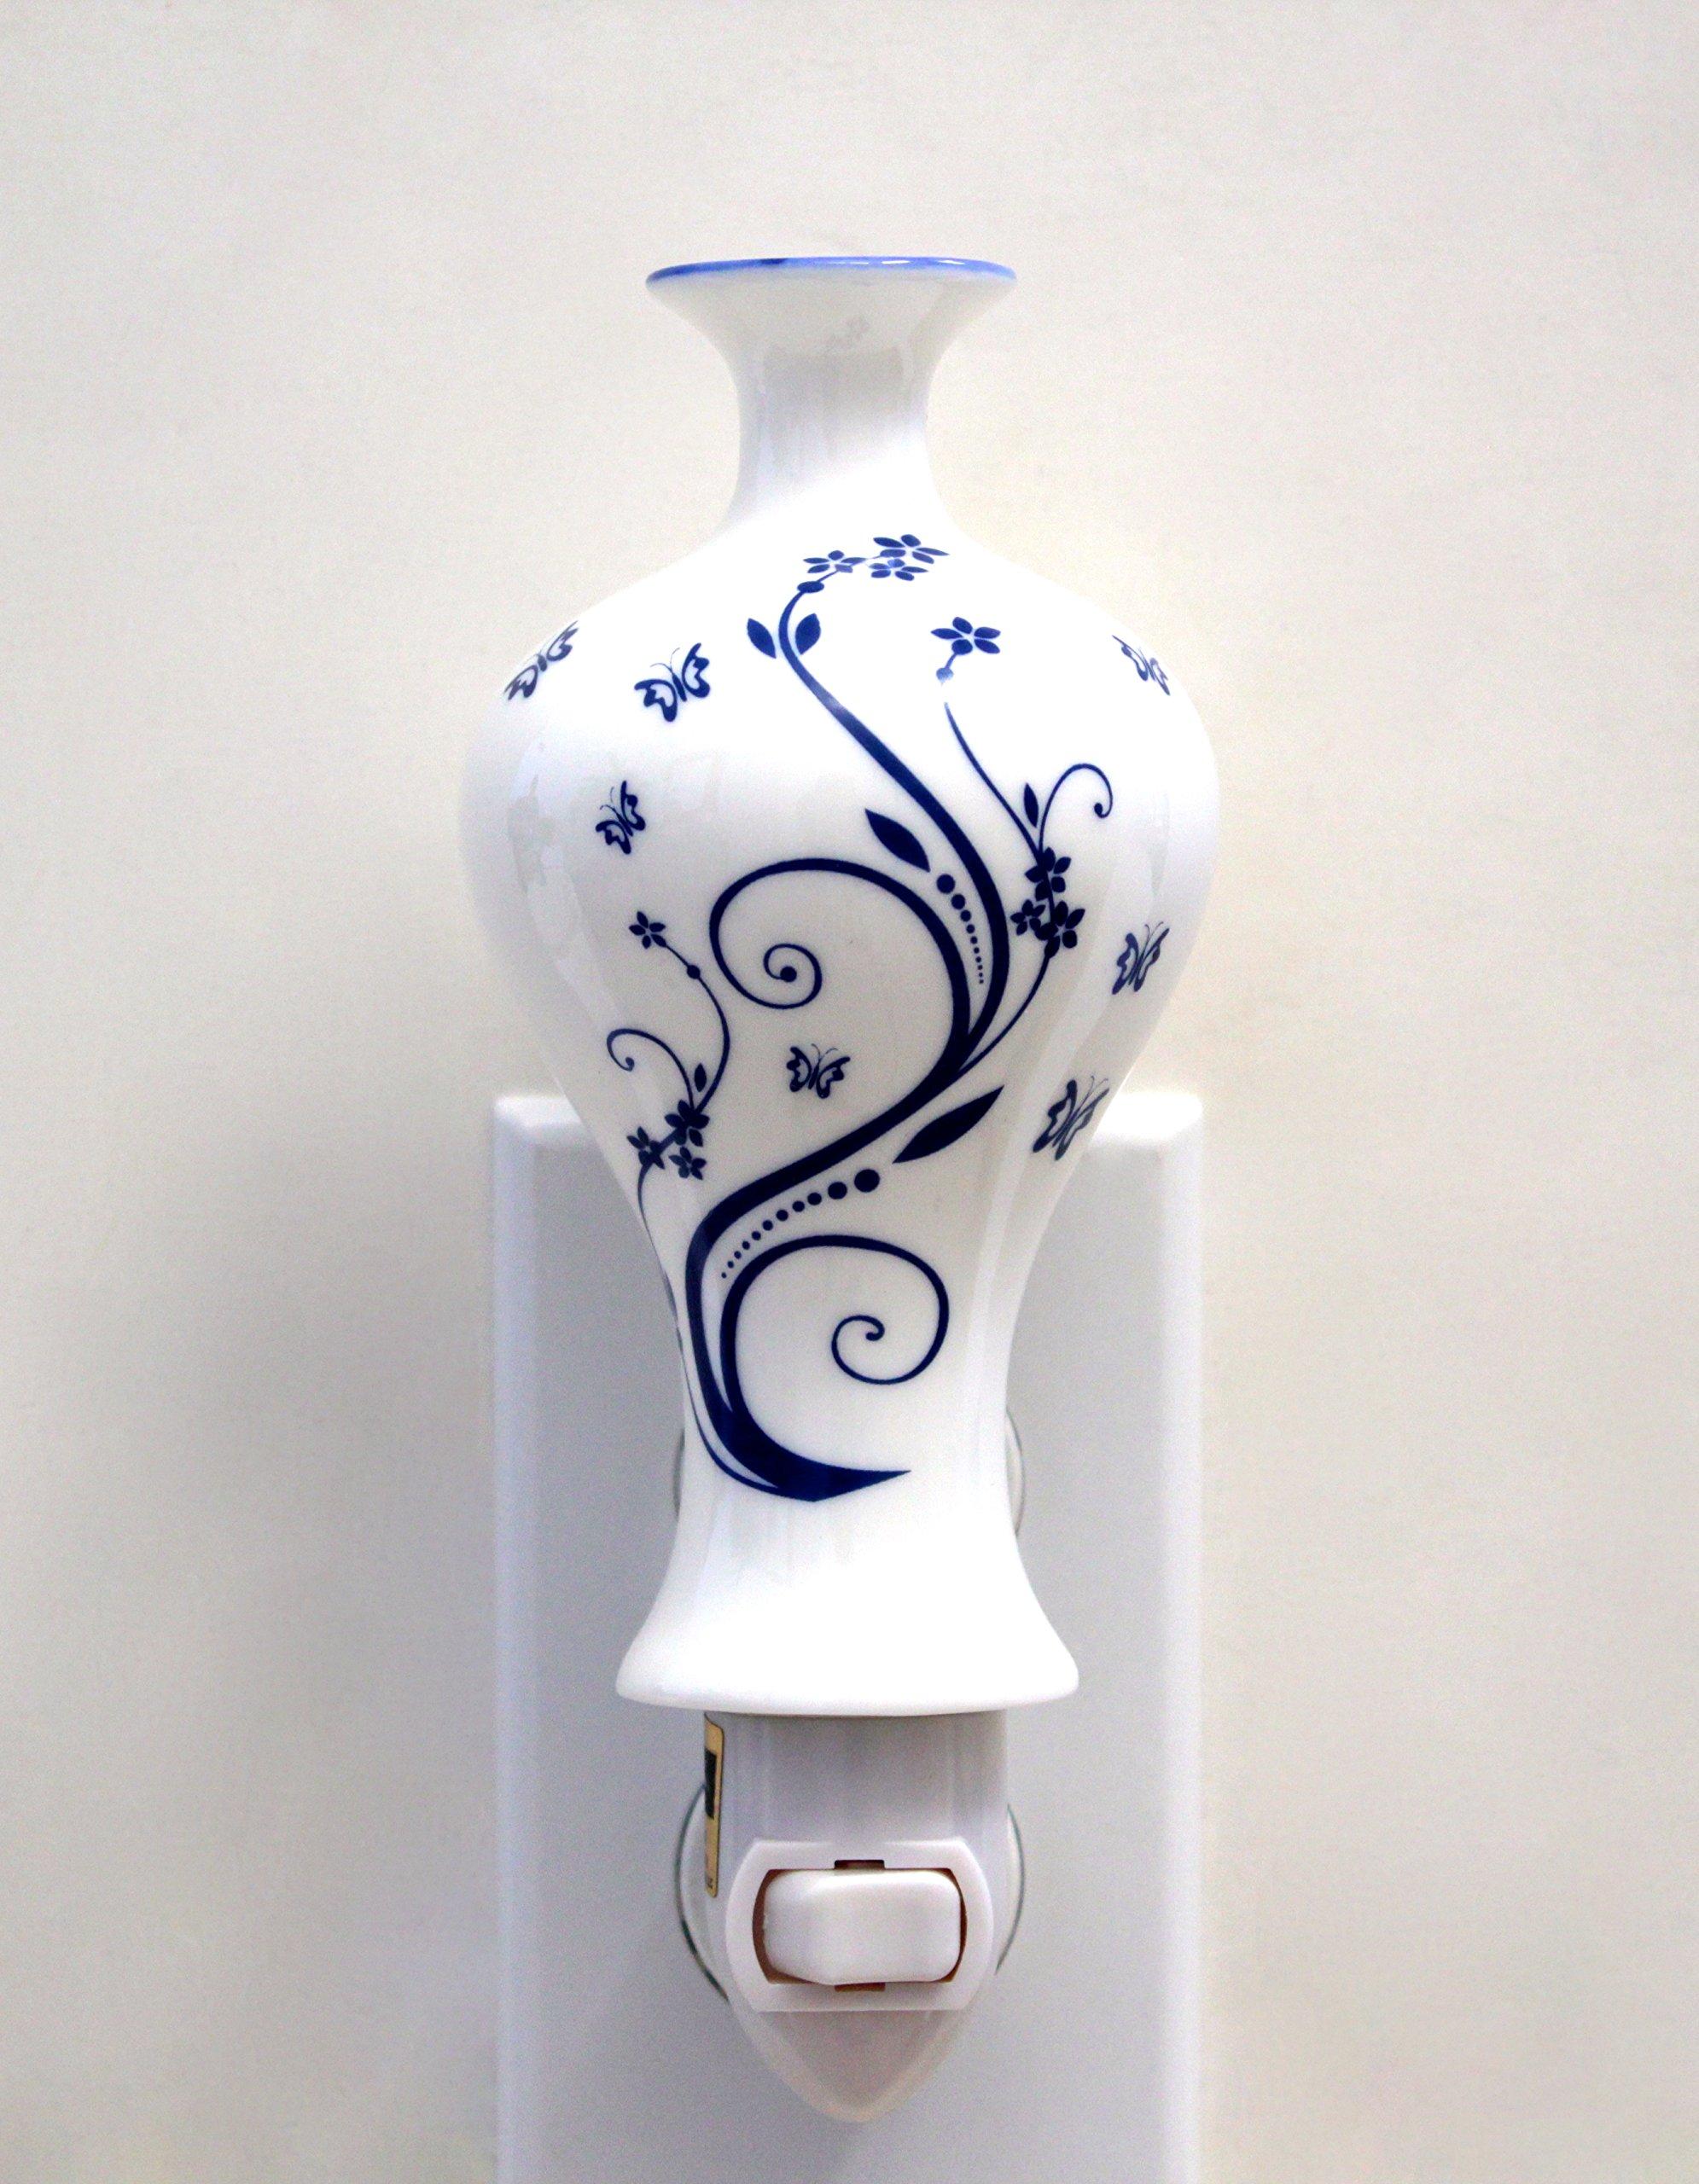 Luxury Elegant Japanese ceramic vase modern style nightlights, Night Light,Night Lamp,Decotations Night Lights By C&H